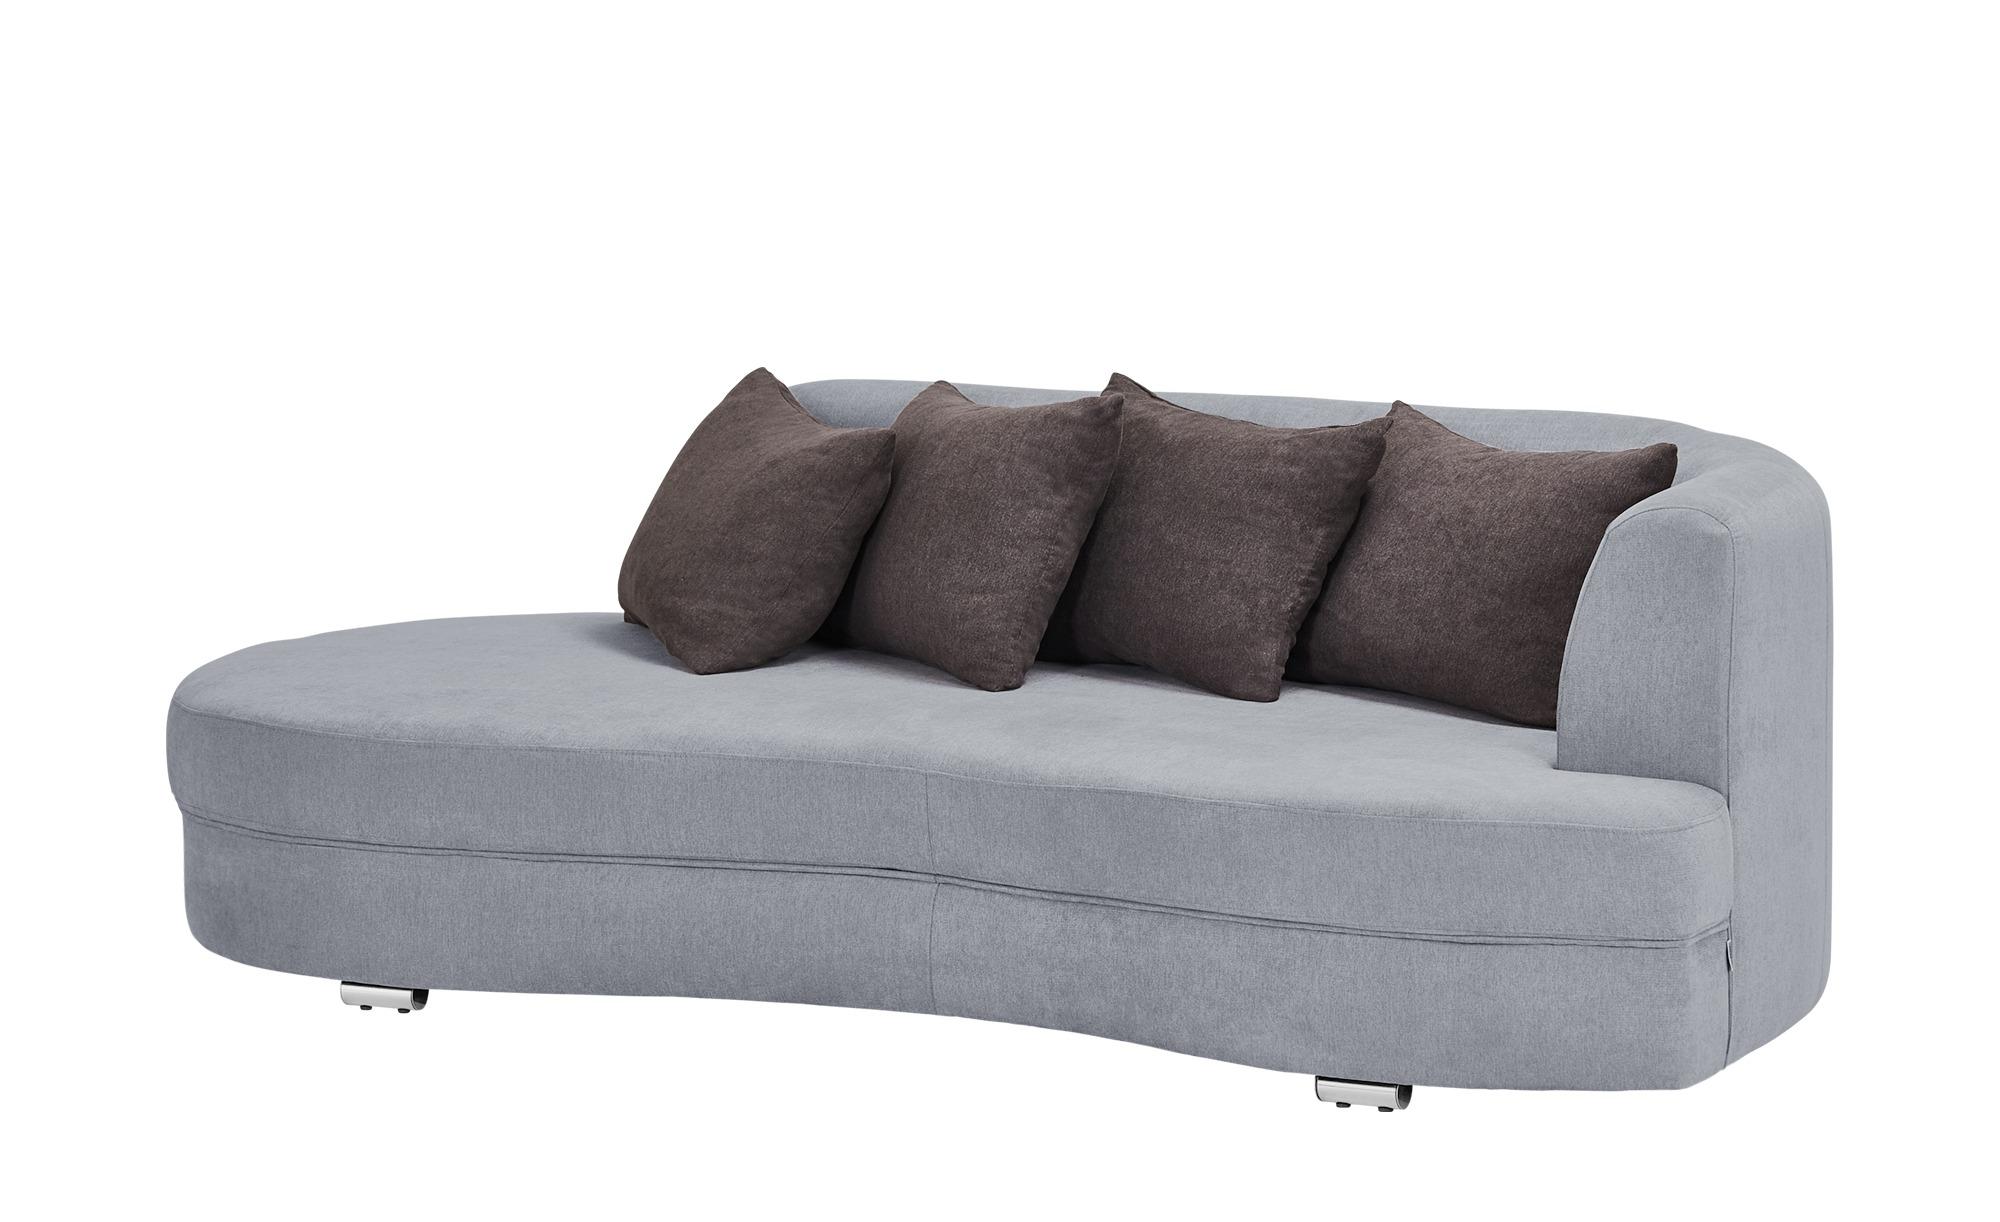 smart big sofa silbergrau schlamm bei m bel kraft. Black Bedroom Furniture Sets. Home Design Ideas